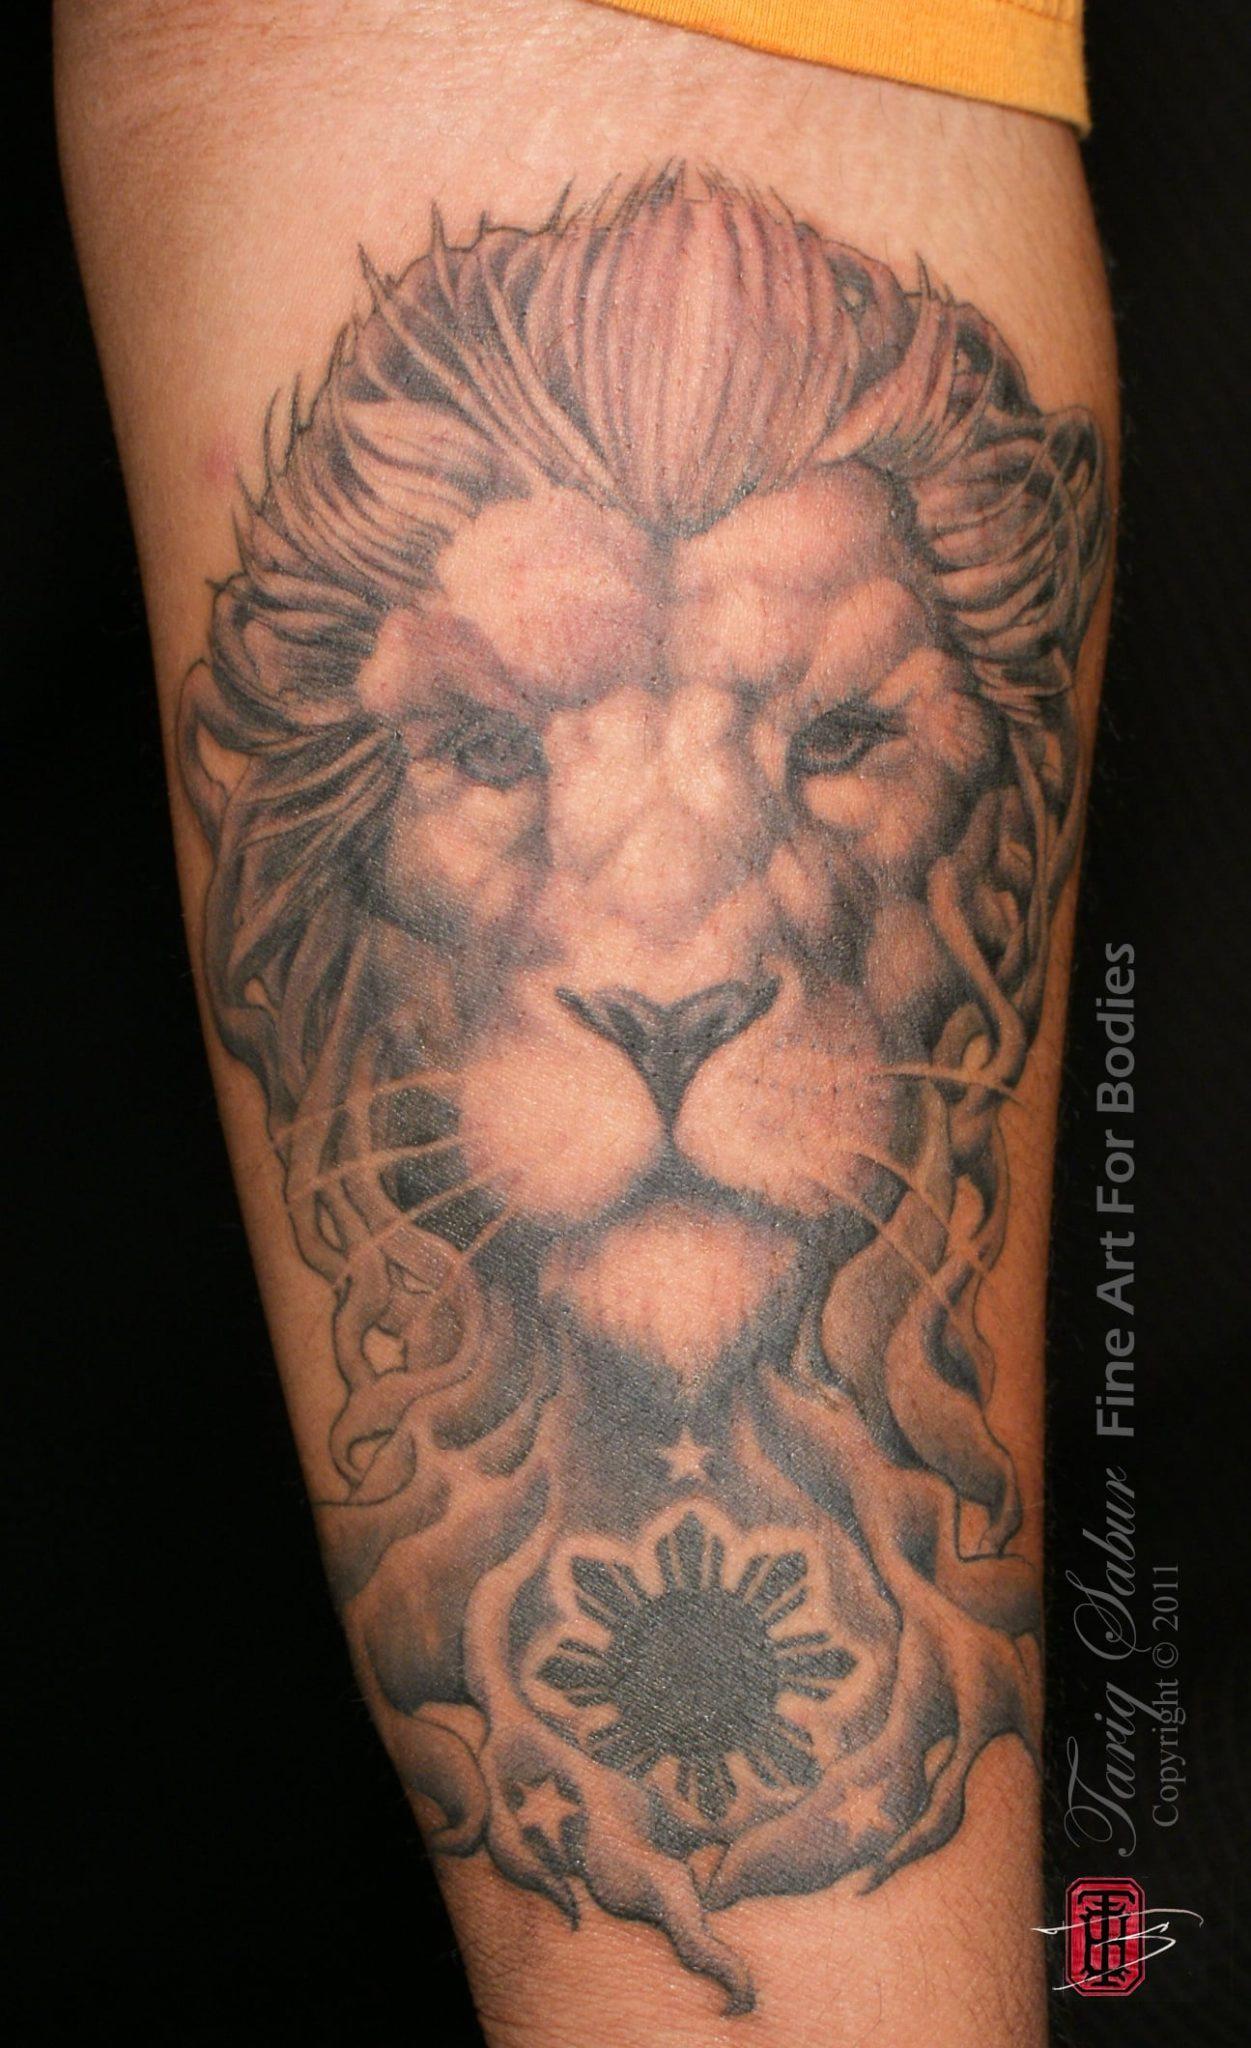 Fillipino Phillipino Mangrove Lion flag eight point star tattoo sleeve Tempe Tattoo Artist Tariq Sabur Fine Art For Bodies Studio 6